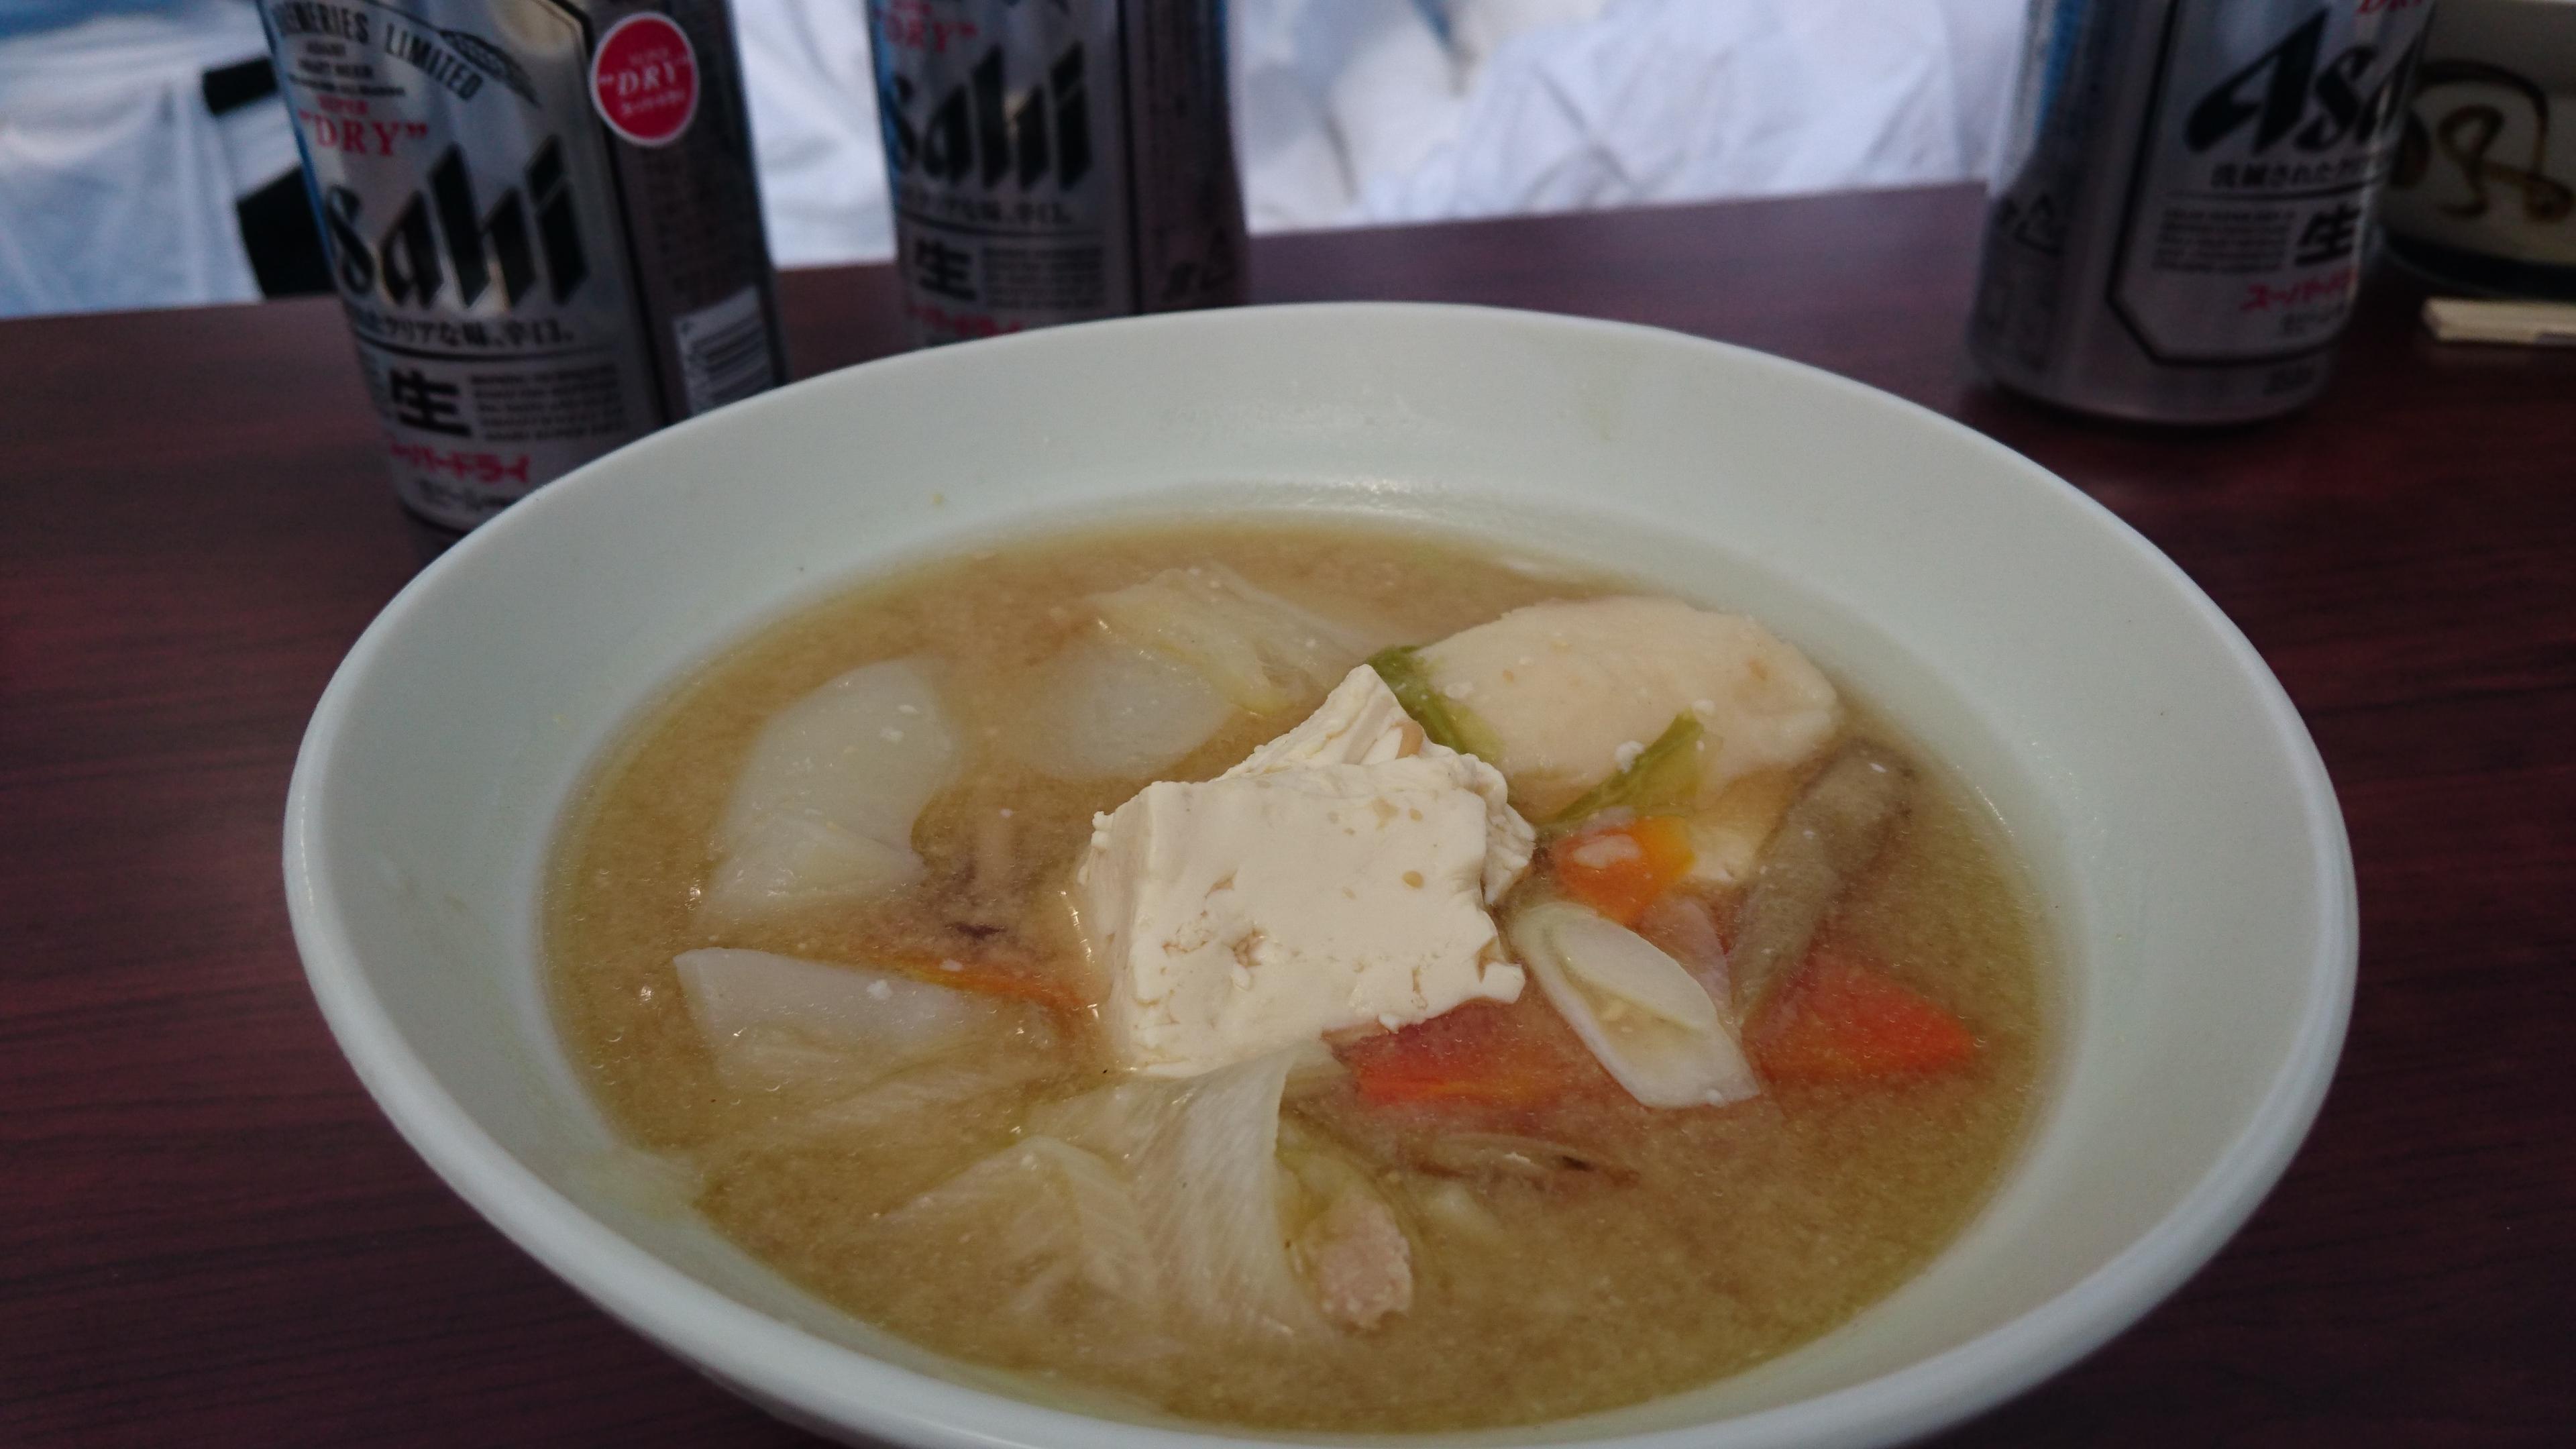 Picture of a tonjiru soup bowl